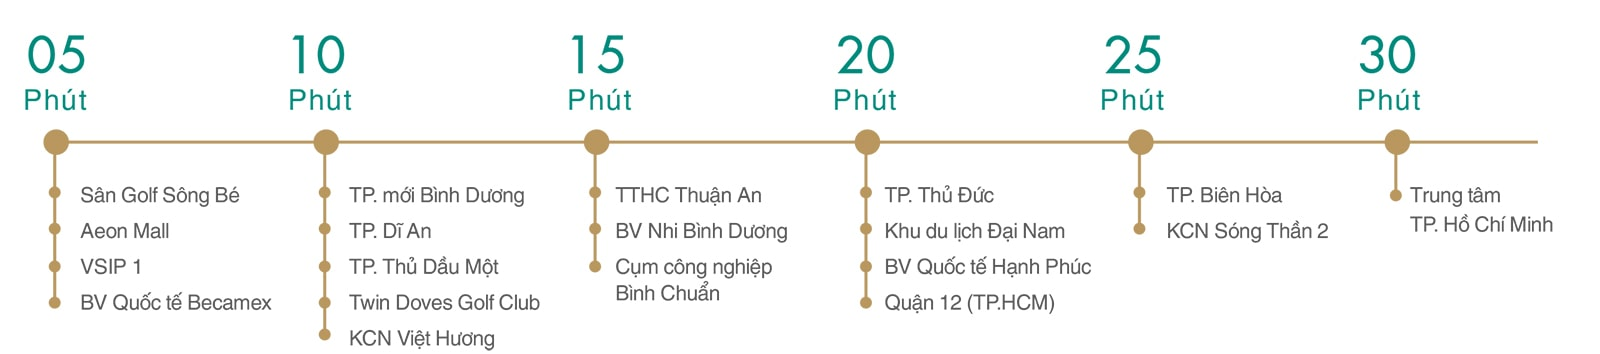 tien-ich-ngoai-khu-04-min